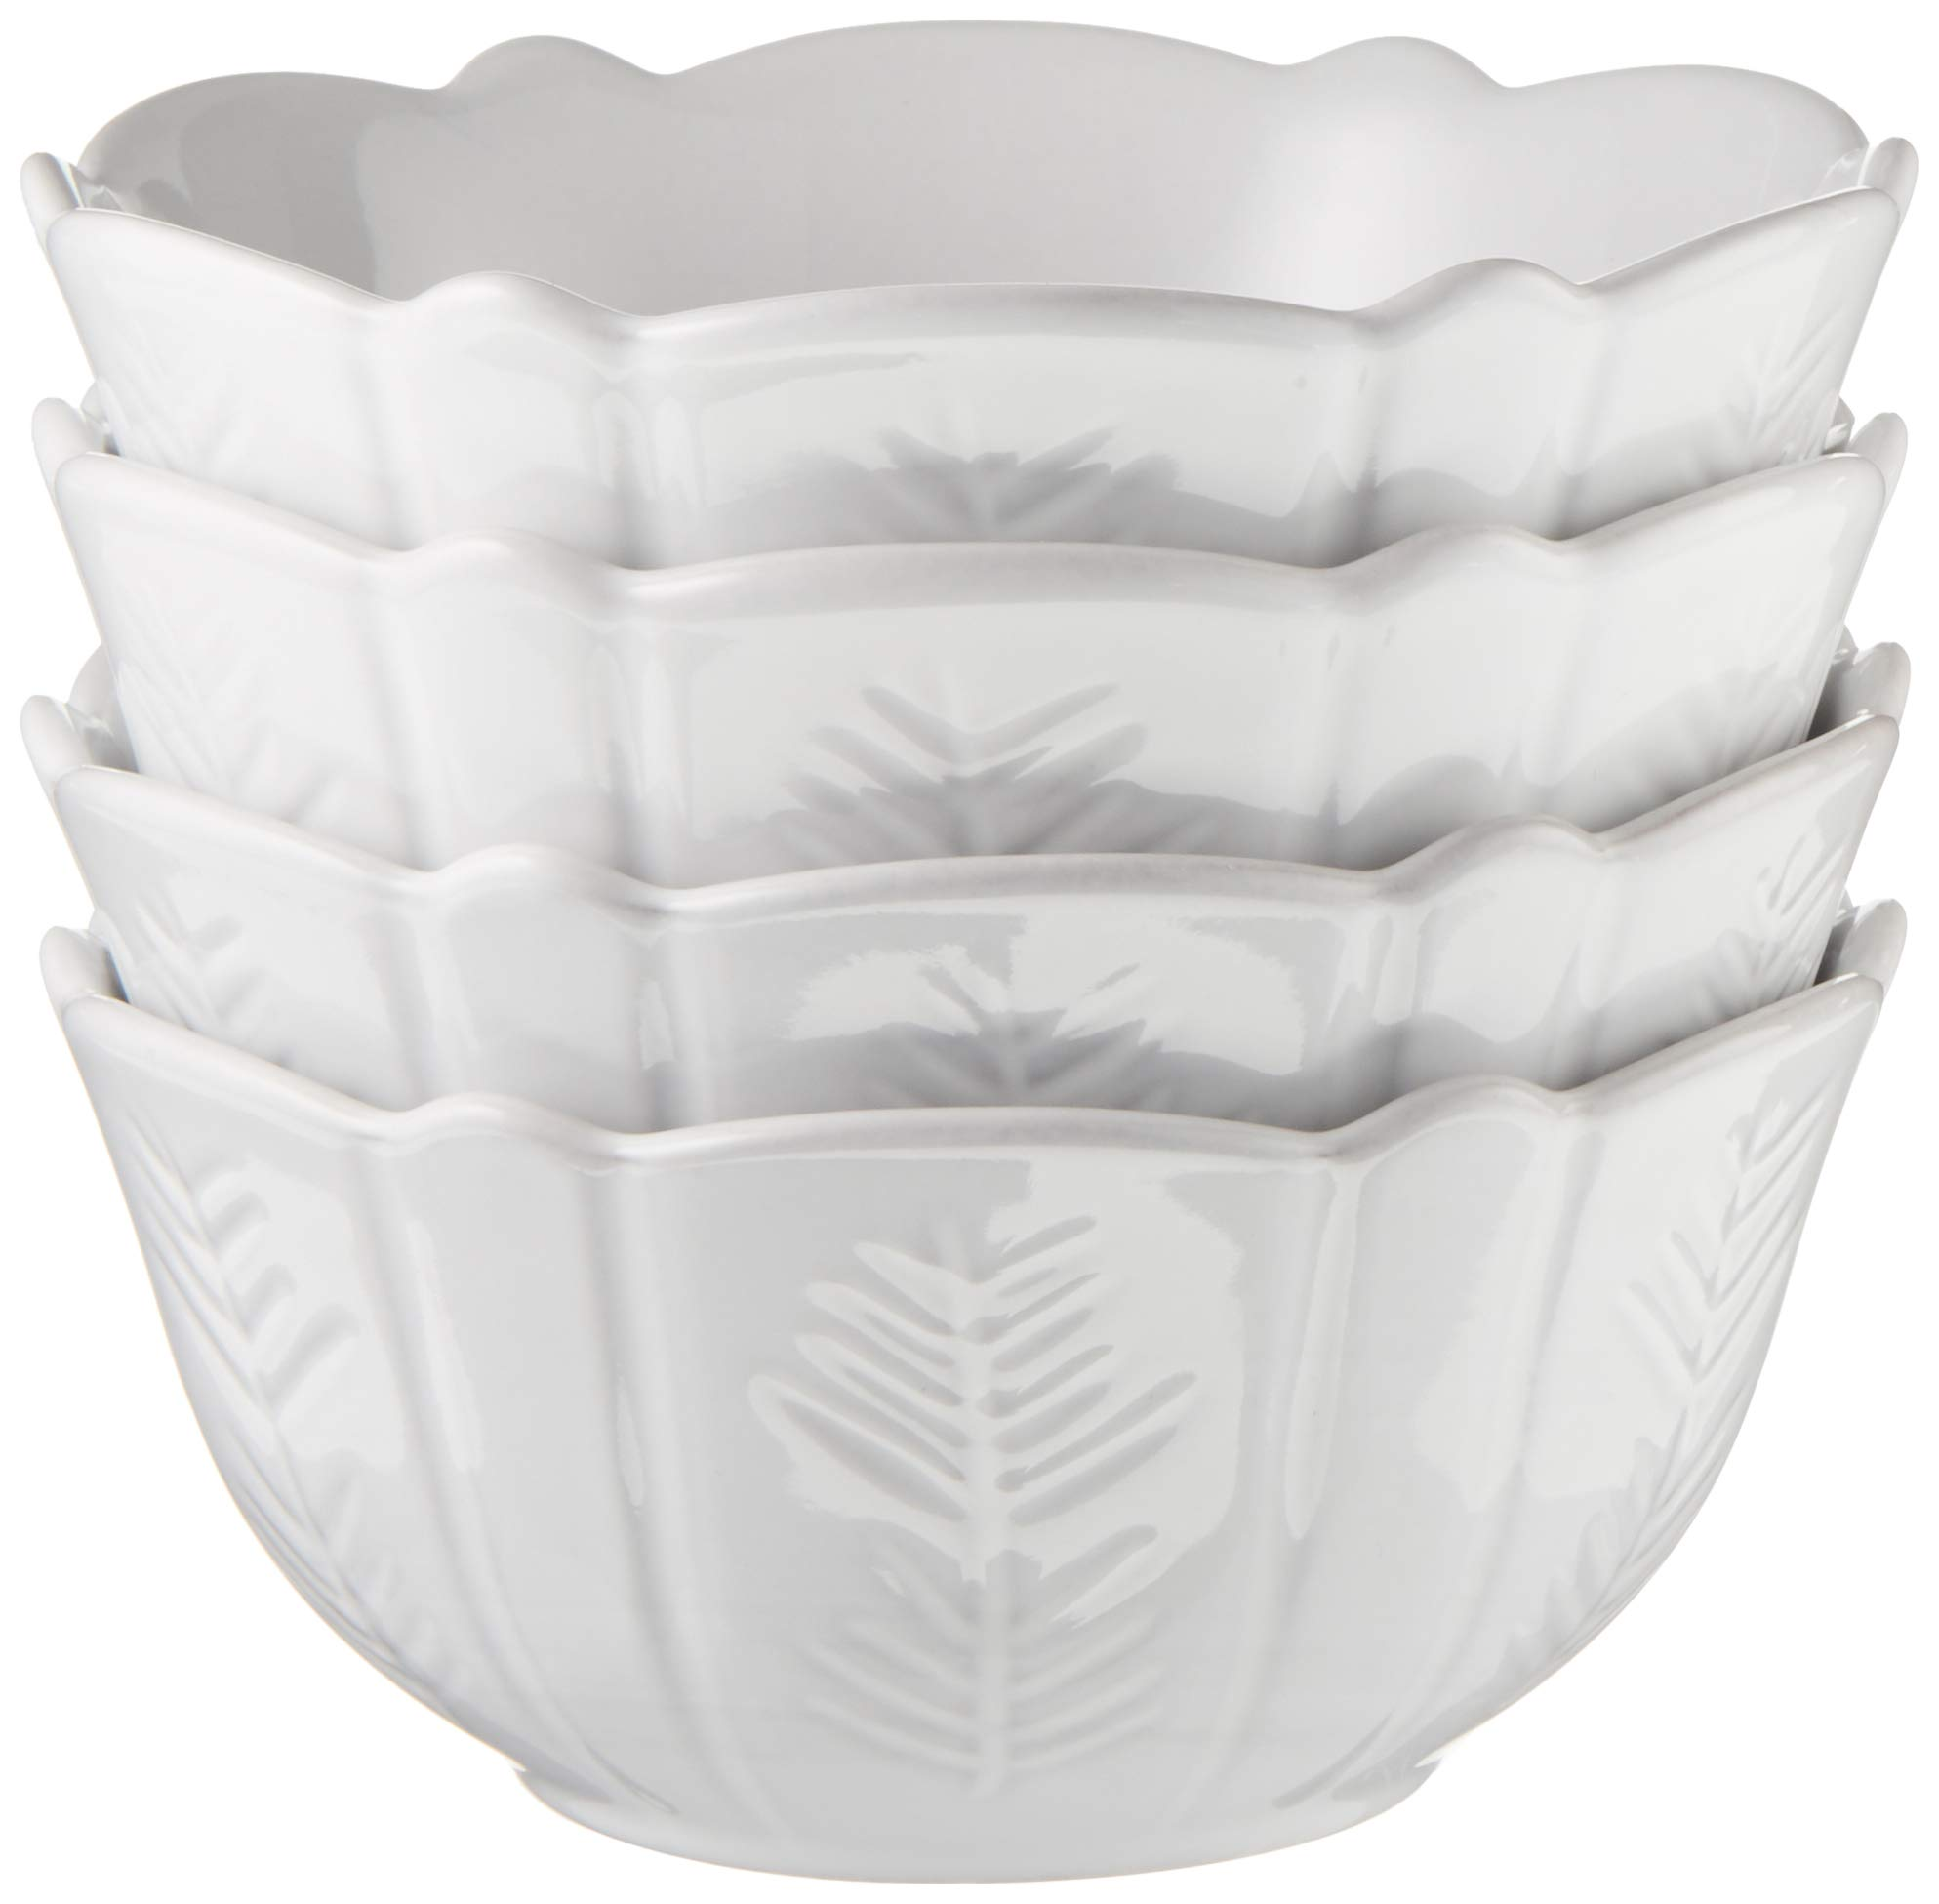 Lenox 879571 Alpine Carved 4-Piece Bowl Set